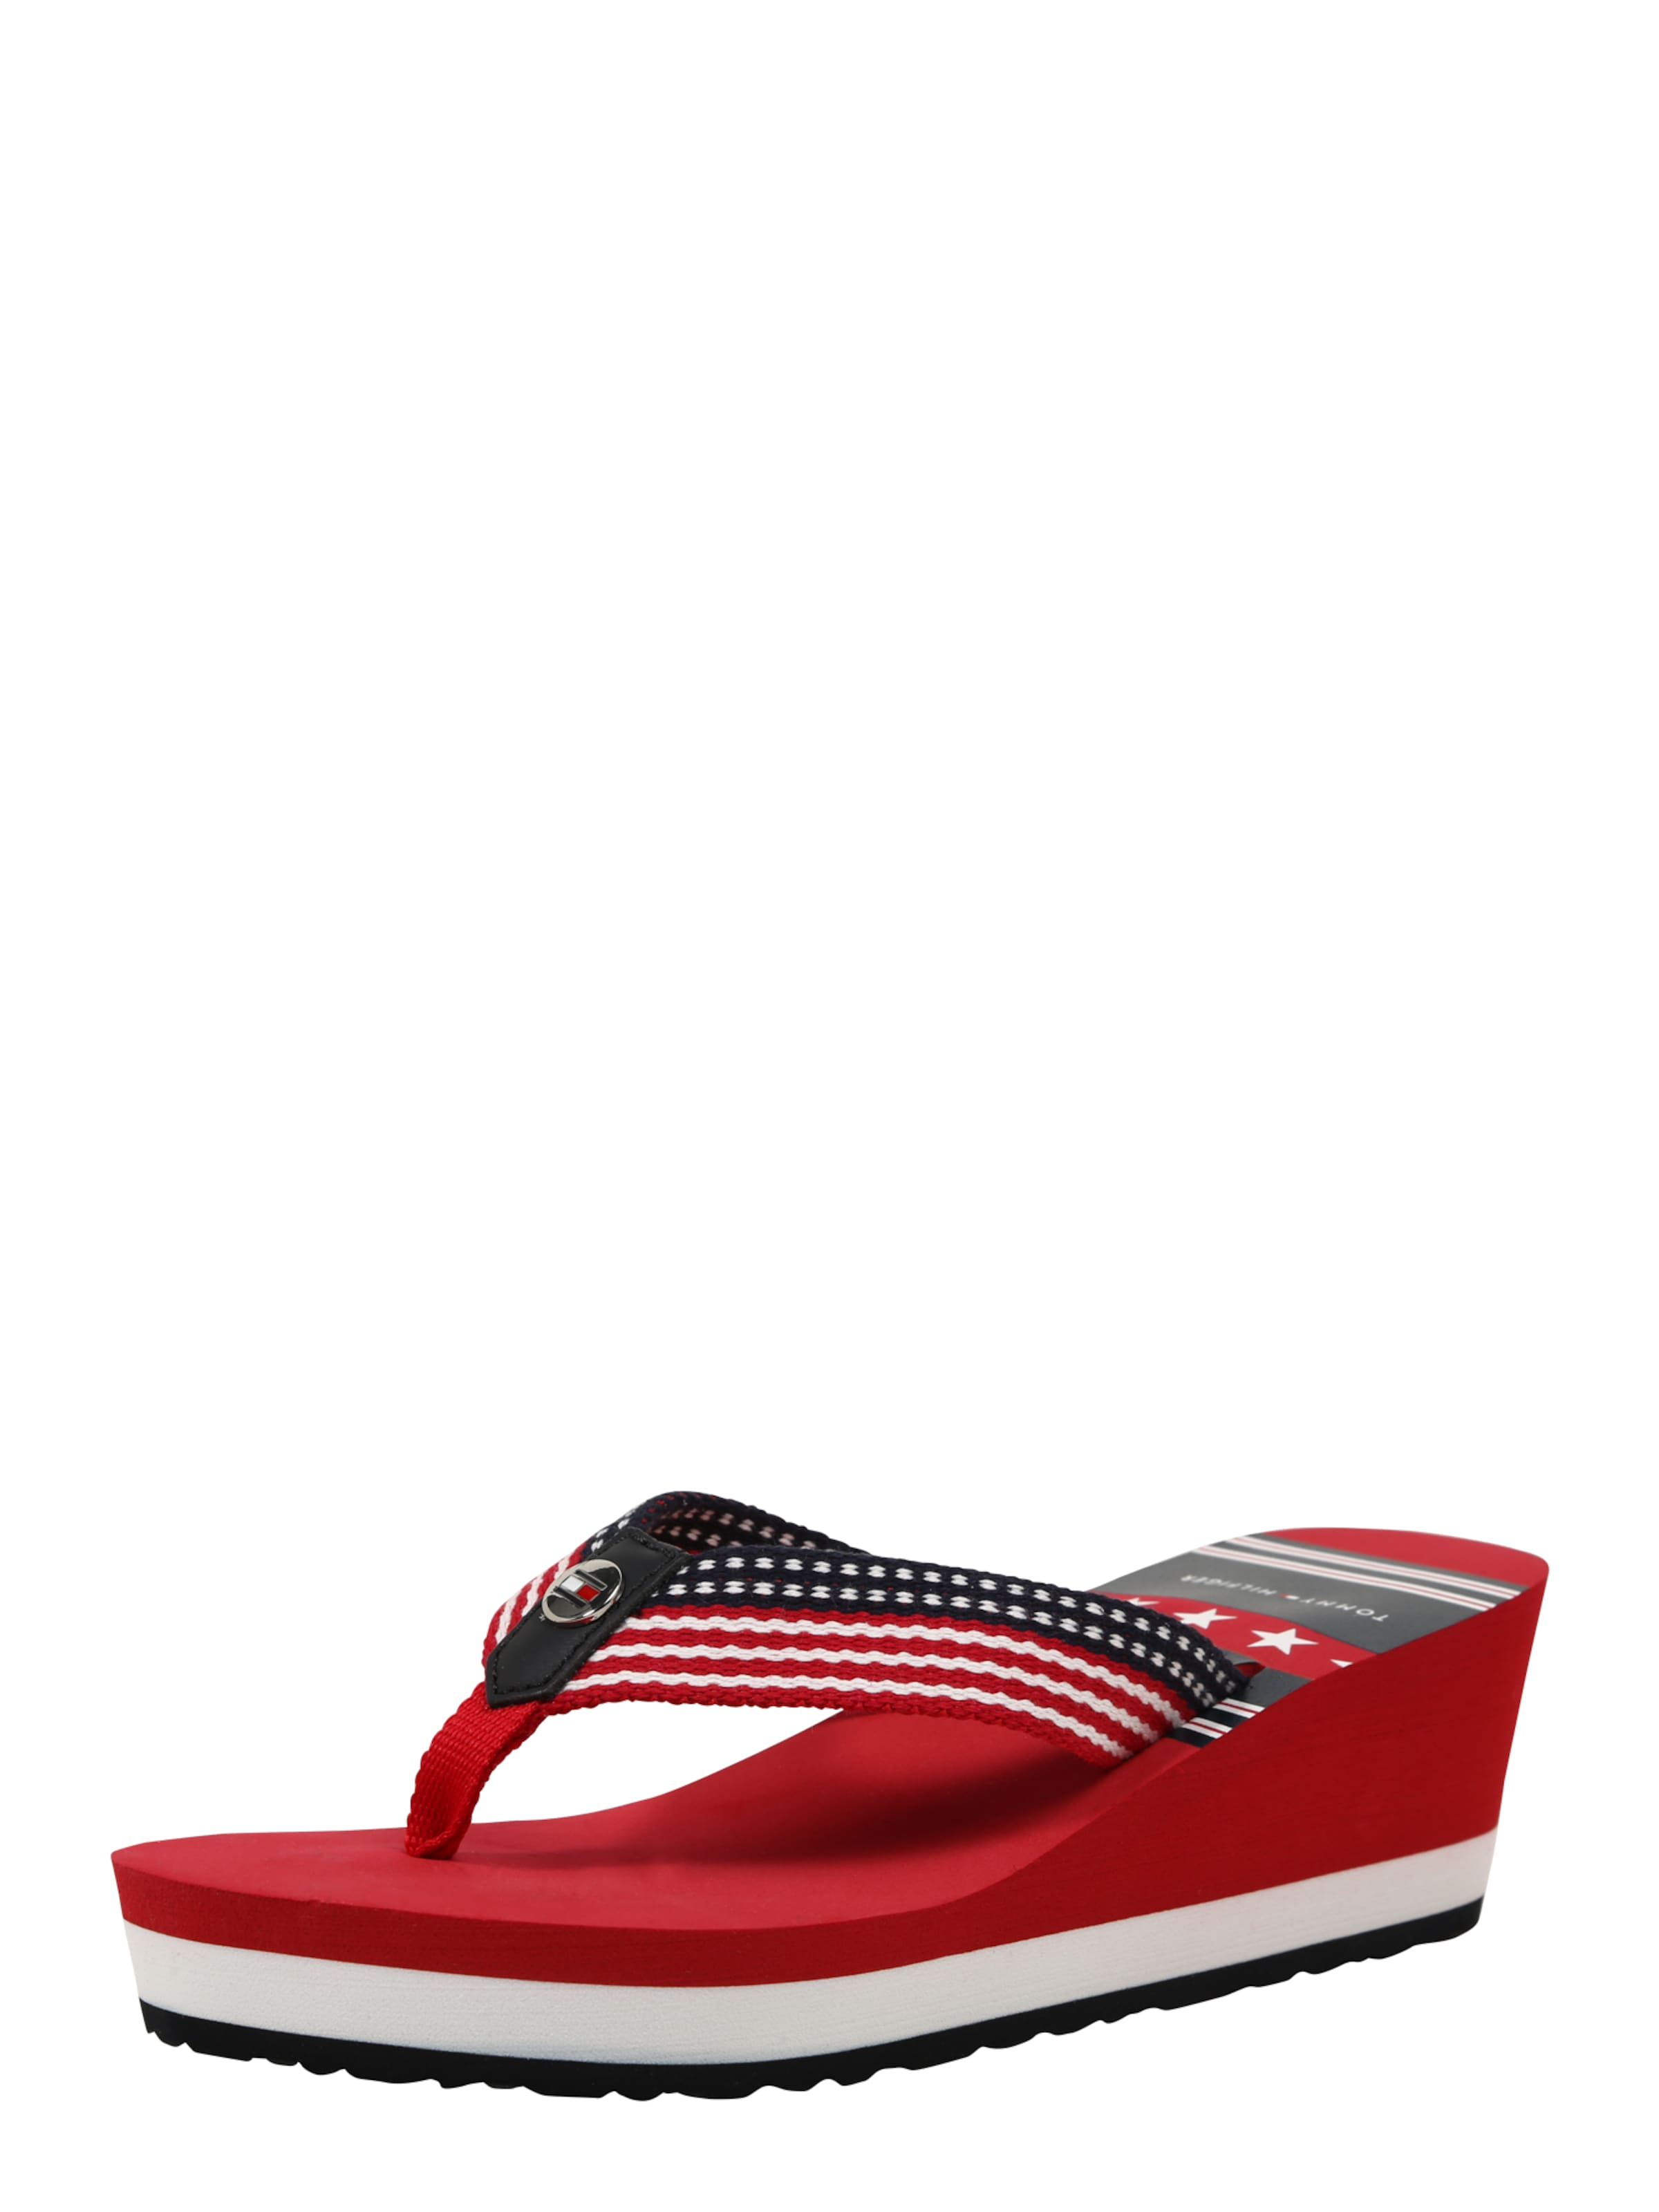 TOMMY HILFIGER Plateau-Sandale Verschleißfeste billige Schuhe